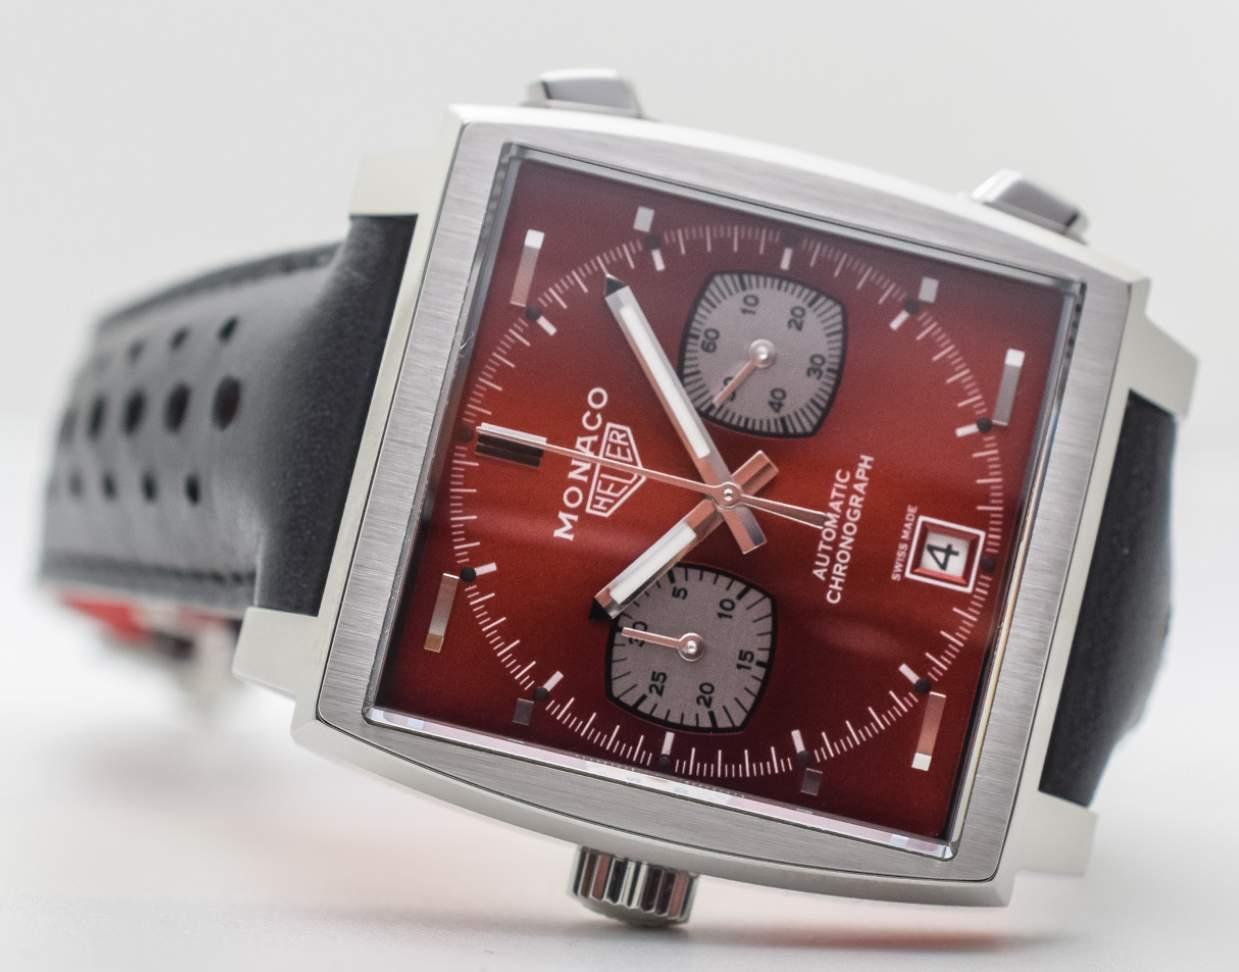 TAG Heuer Monaco 1979-1989 50th Anniversary Limited Edition